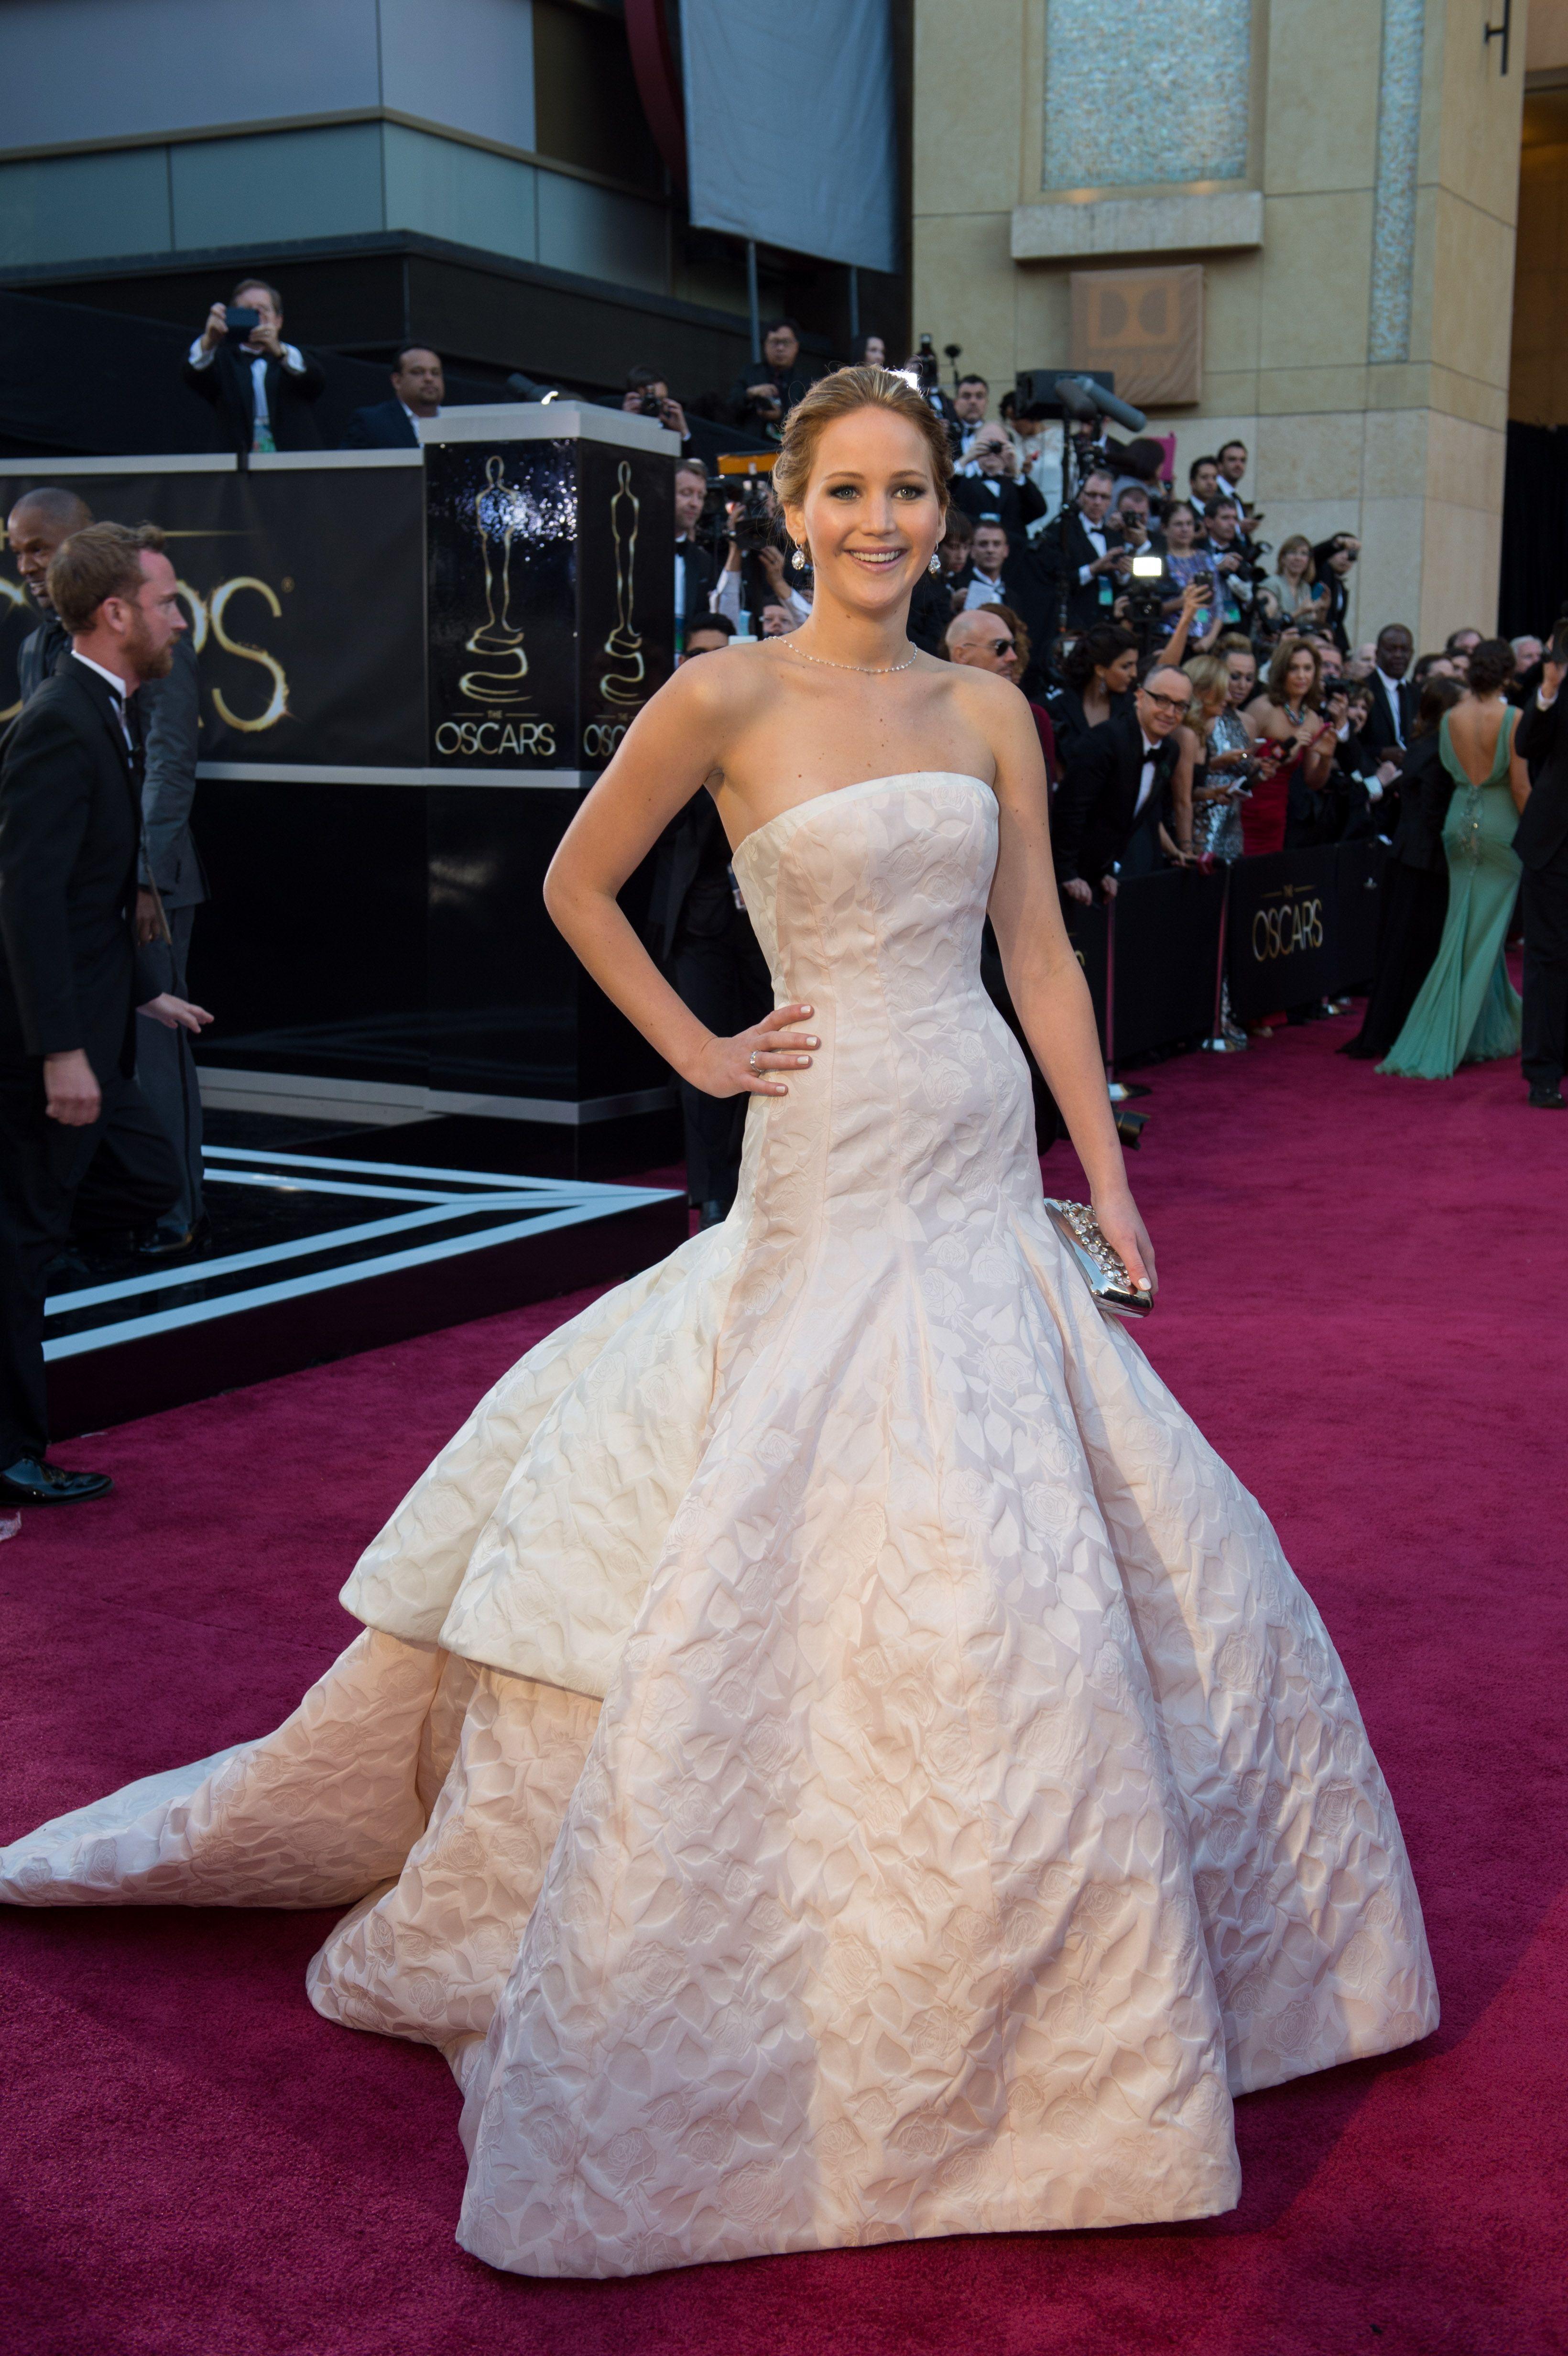 Jennifer-lawrence-2013-oscar-dress | BEST DRESSED | Pinterest